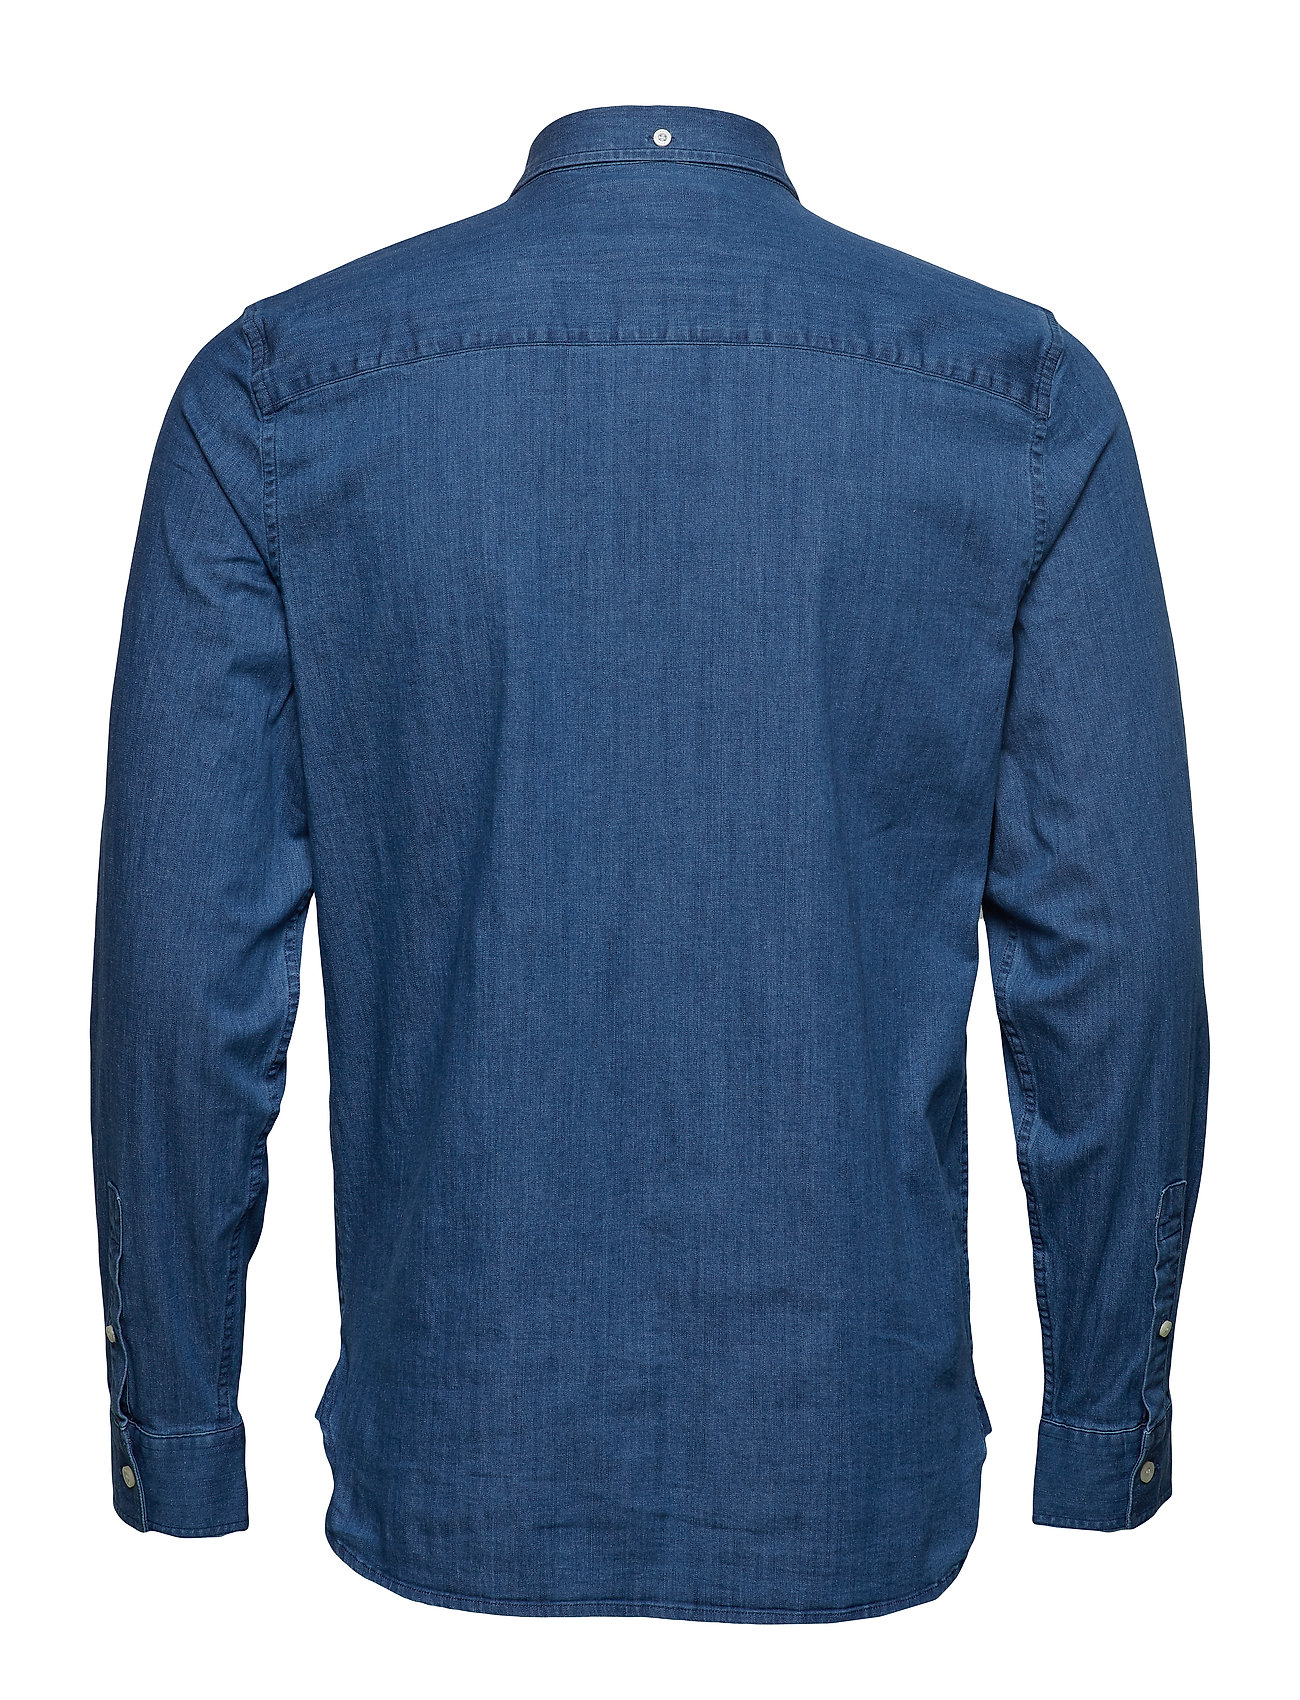 Regular Denim Fit Scott Shirtlight IndigoLyleamp; 5R4AjL3